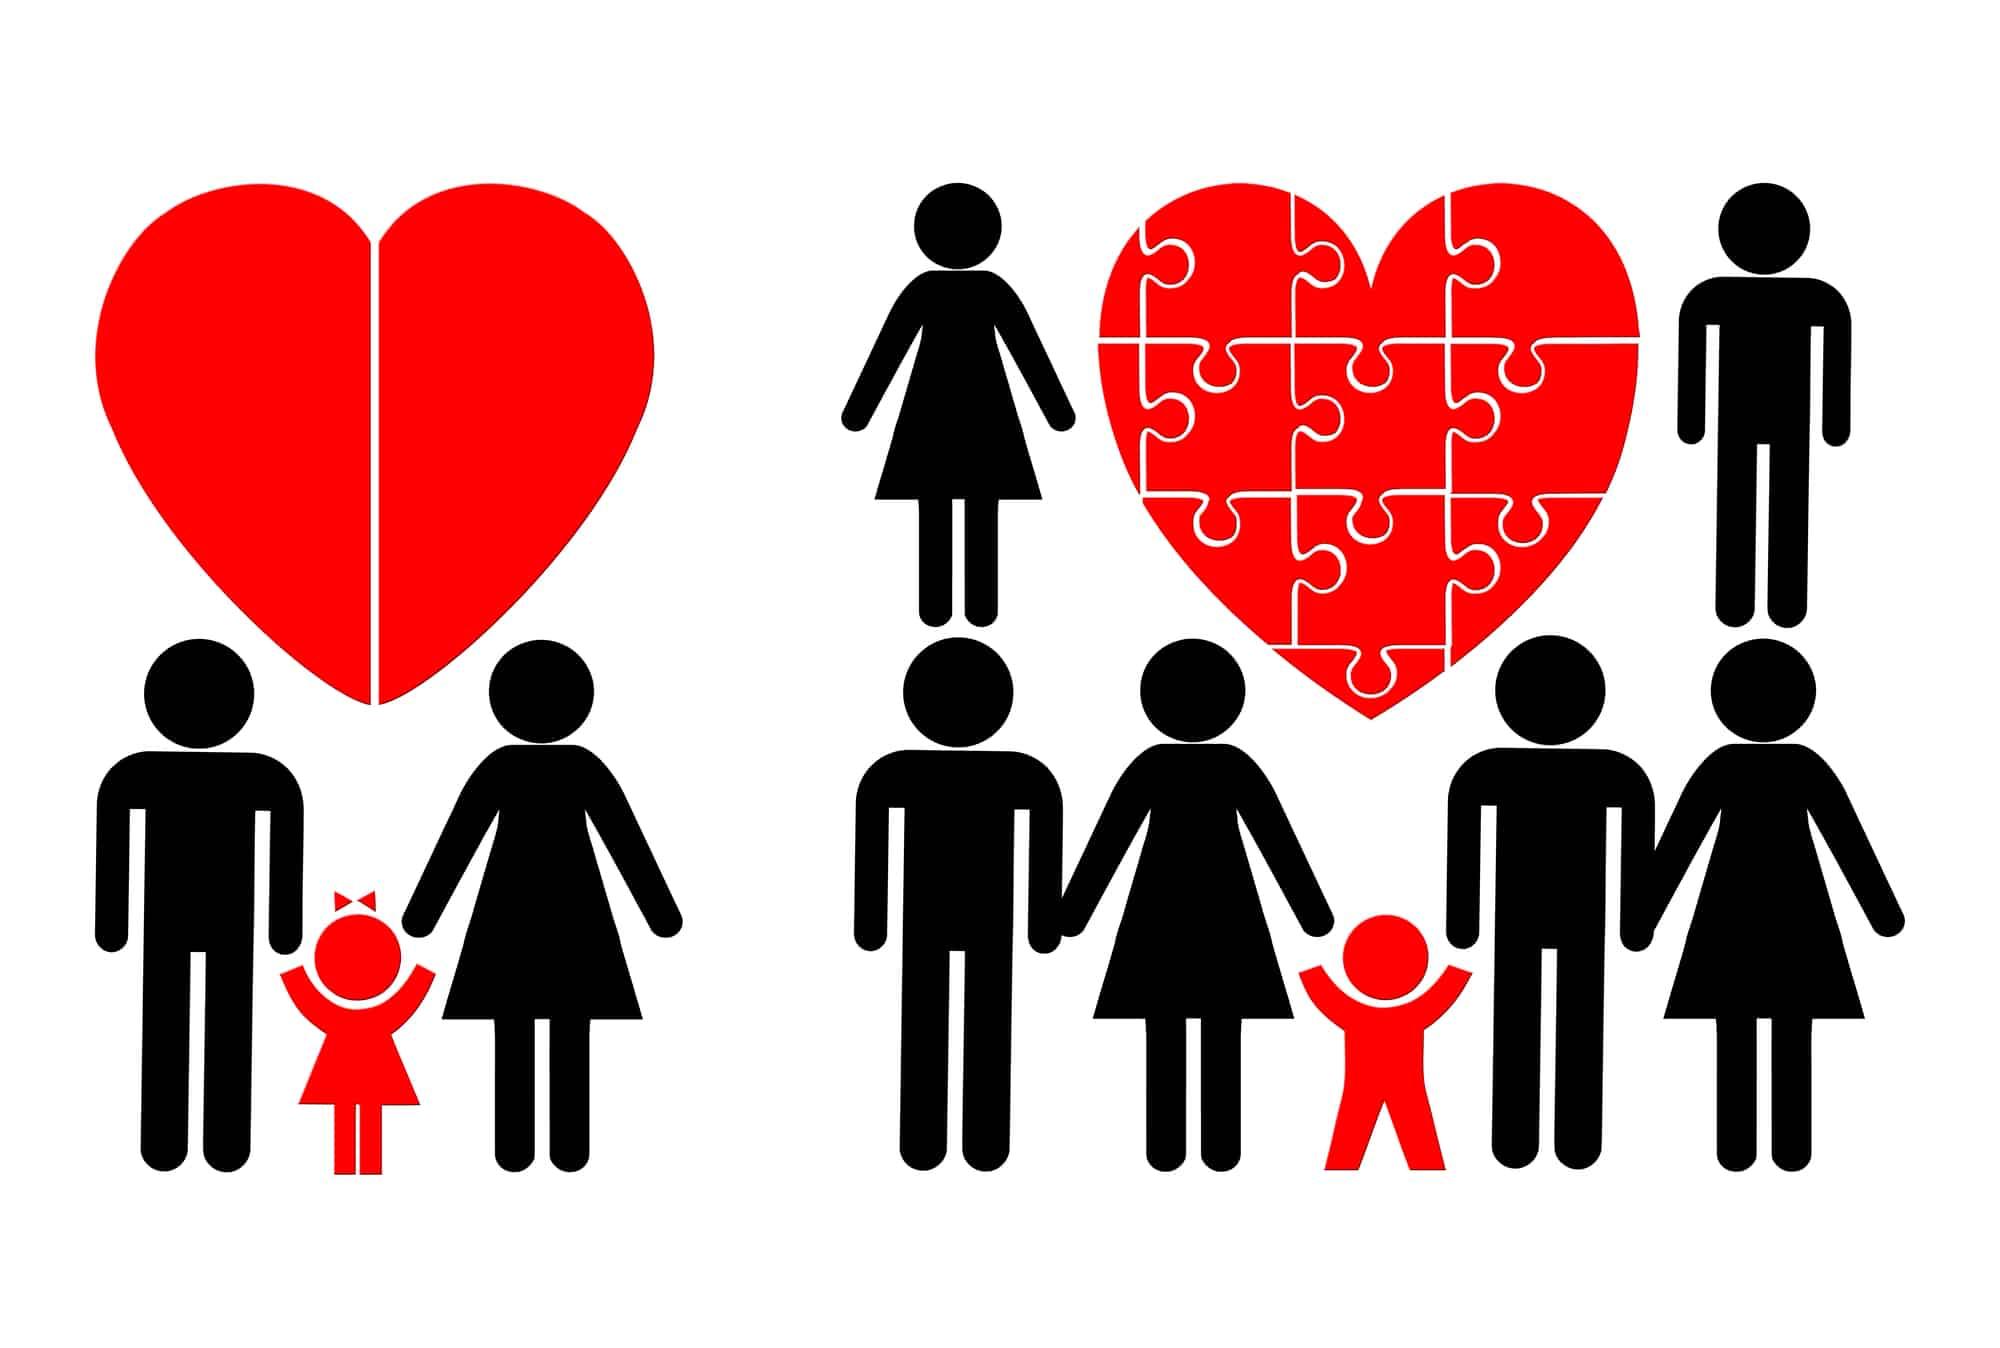 Dibujo de familia mezclada, reconstituida o compuesta